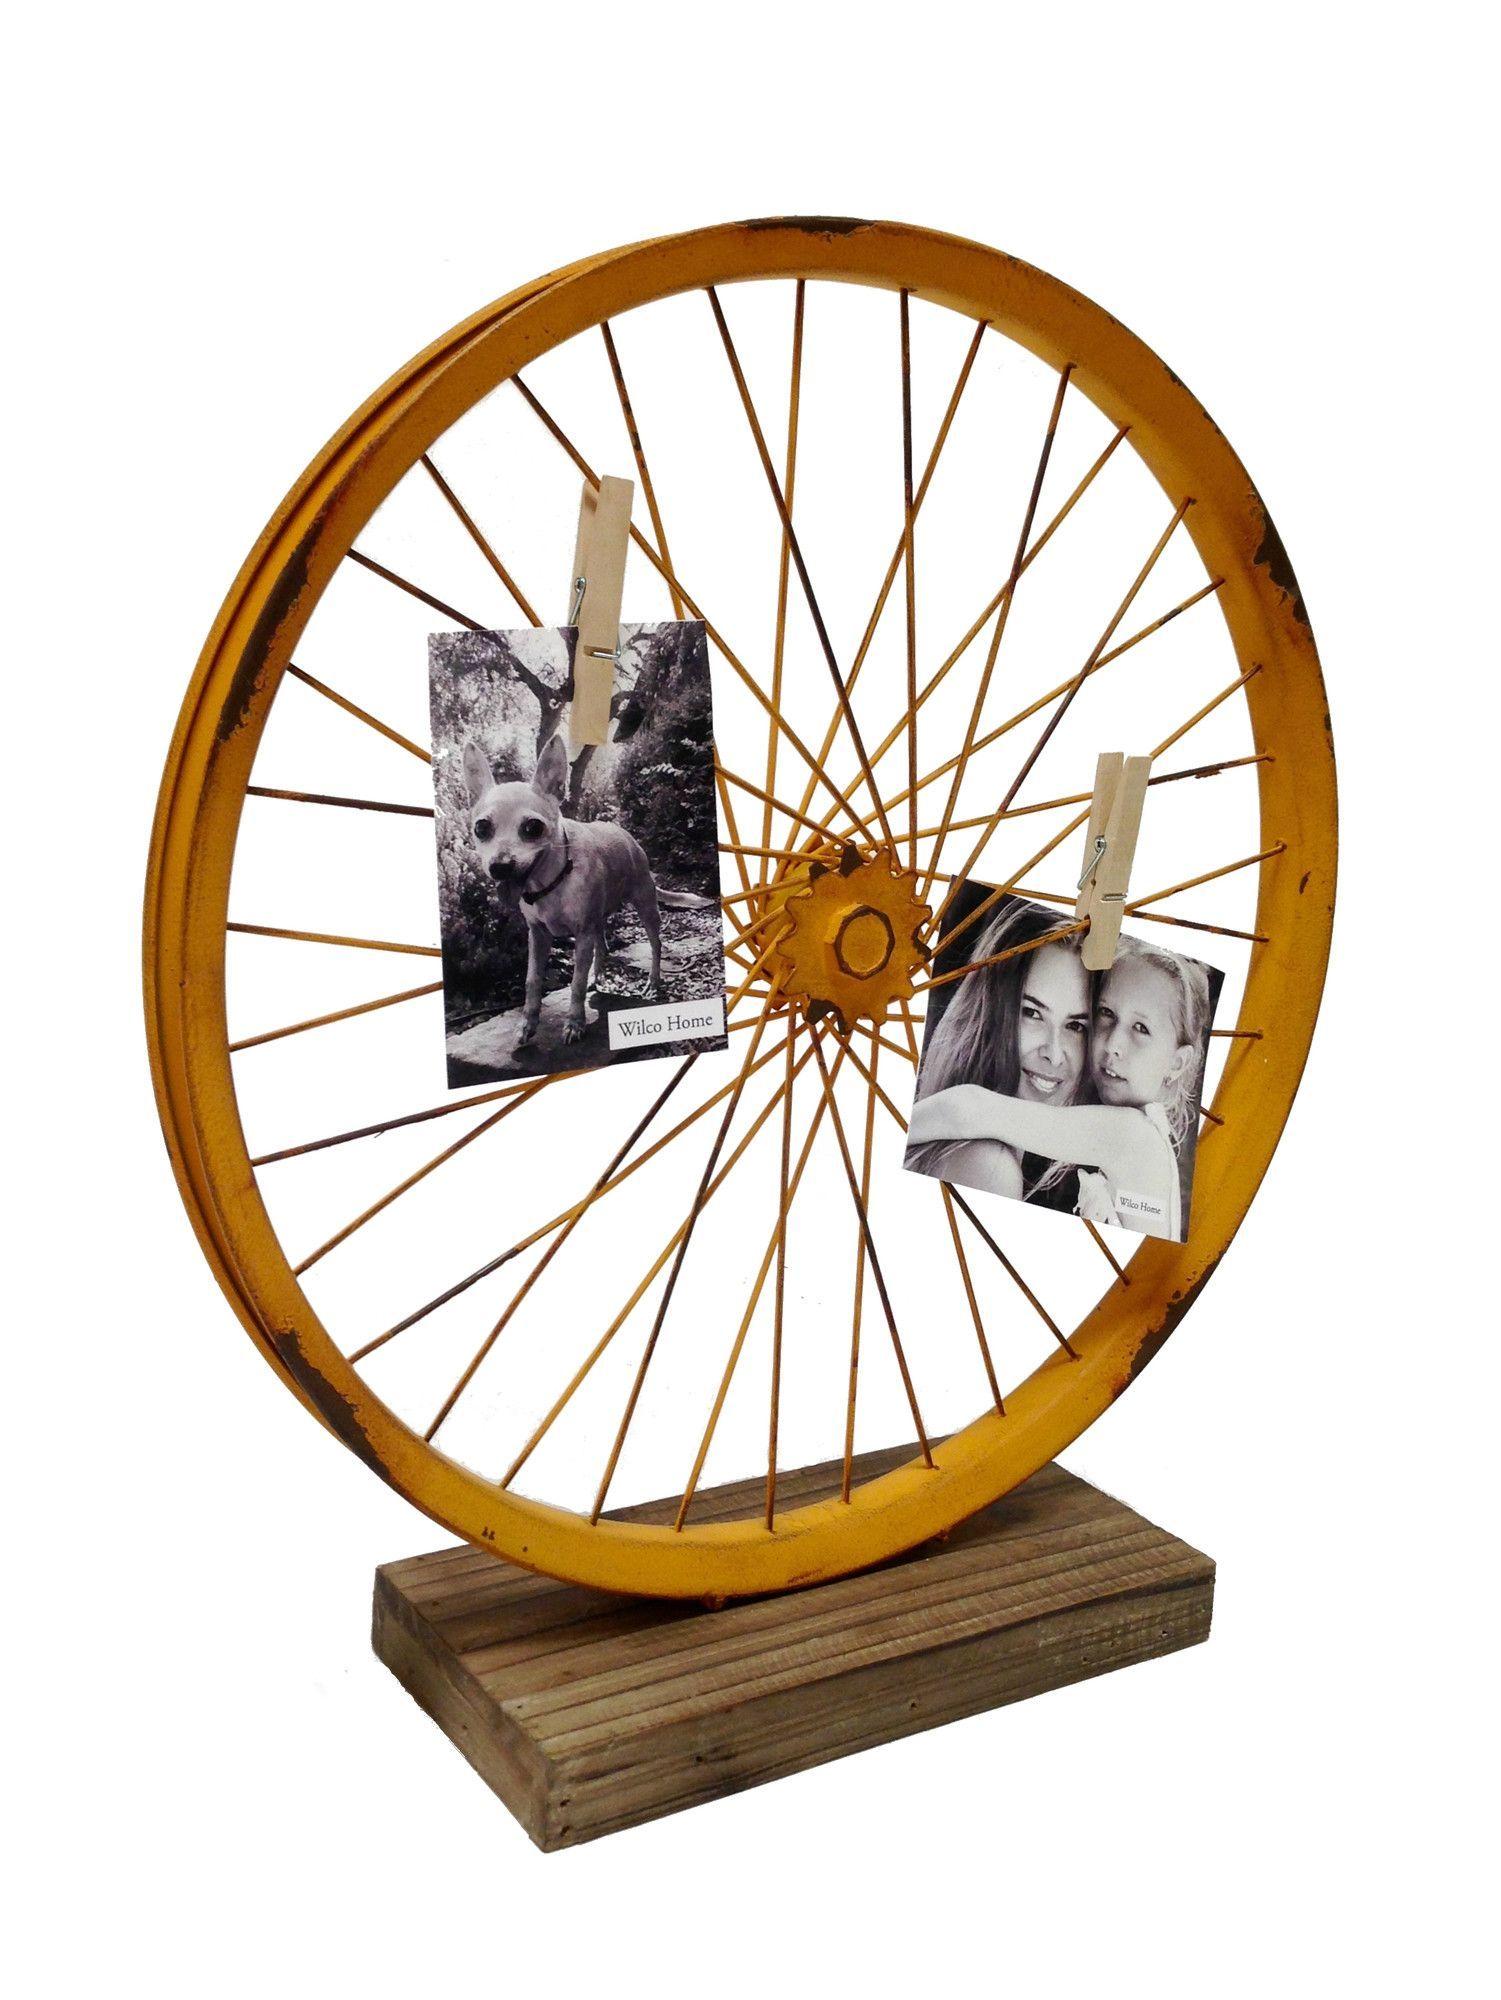 Metal Bike Wheel Table Art Sculpture | Manualidades fáciles, Ruedas ...